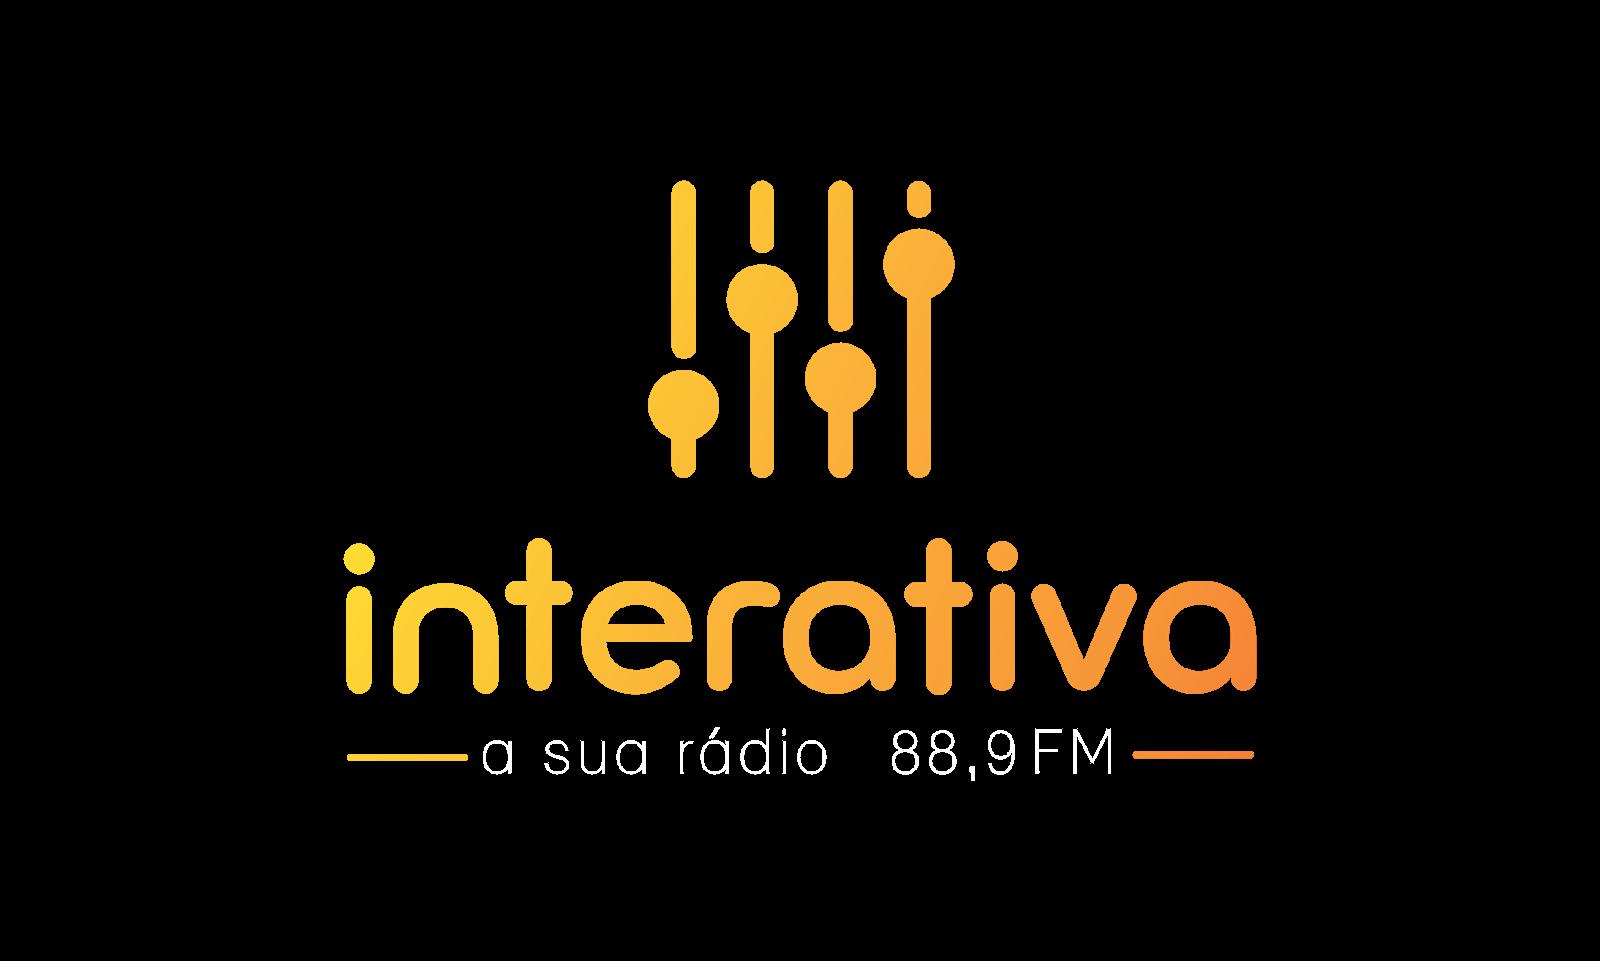 Interativa 88,9